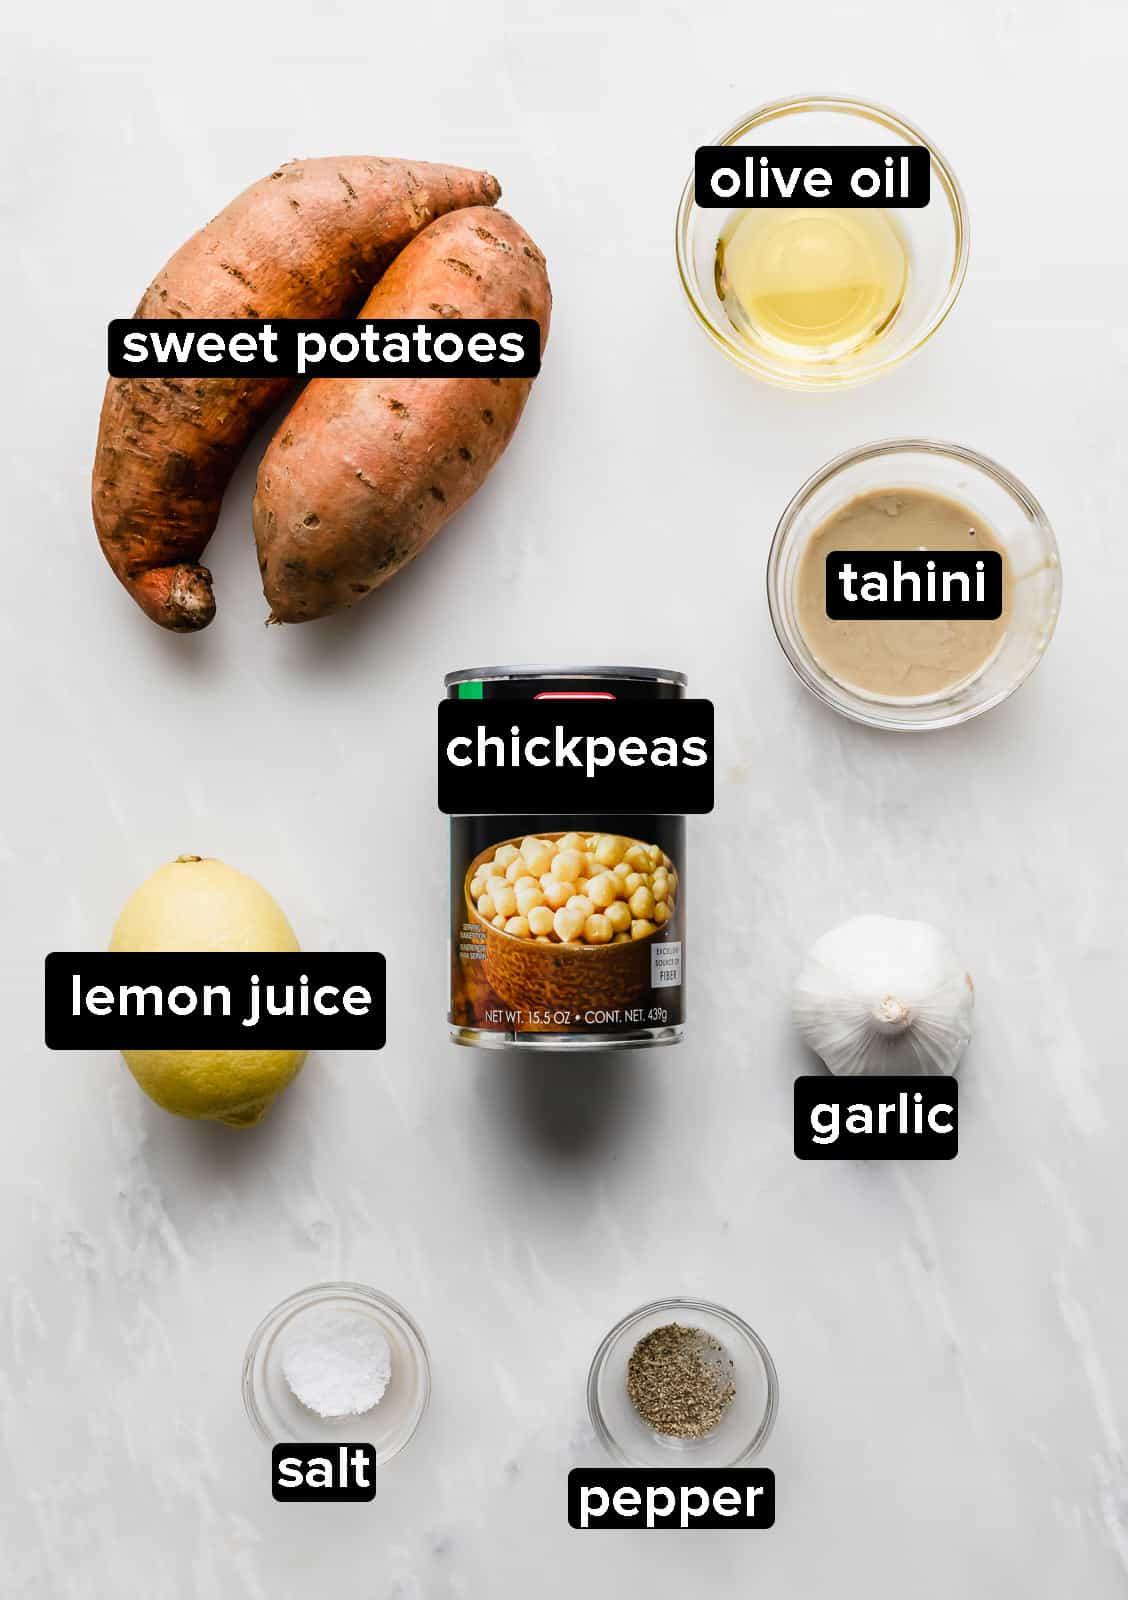 ingredients used to make sweet potato hummus on a white background.